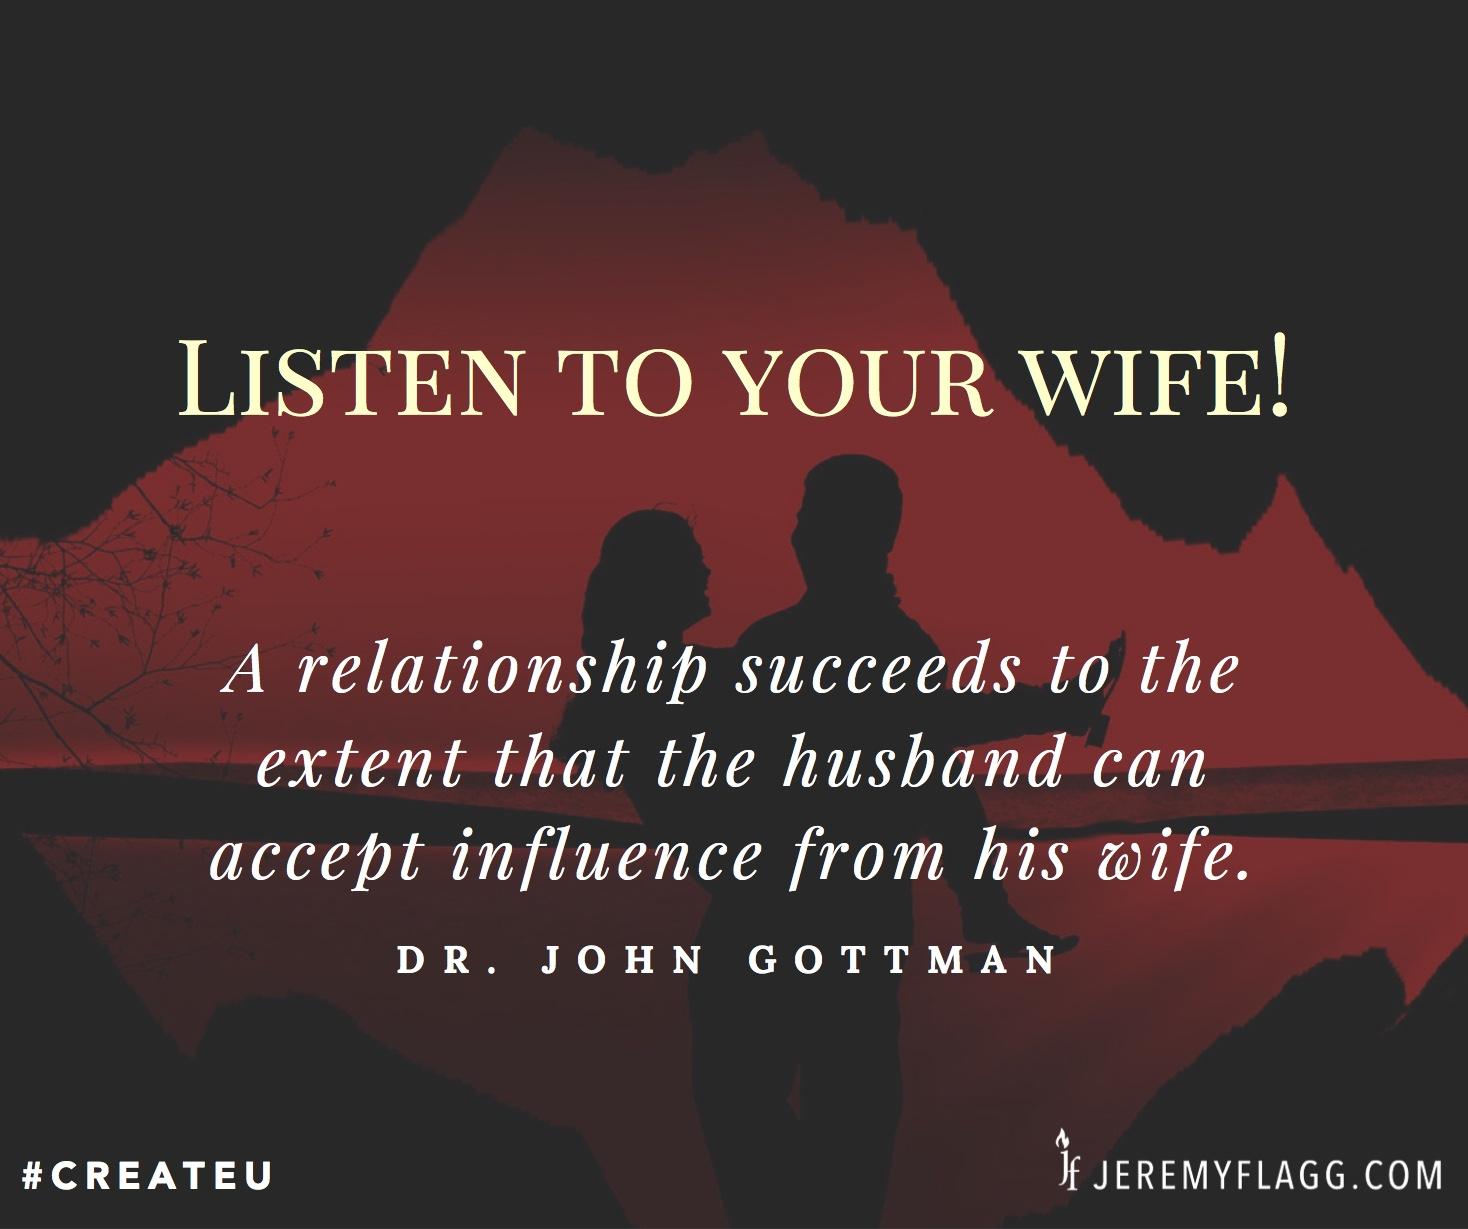 Listen-to-your-wife-John-Gottman-quote-FB